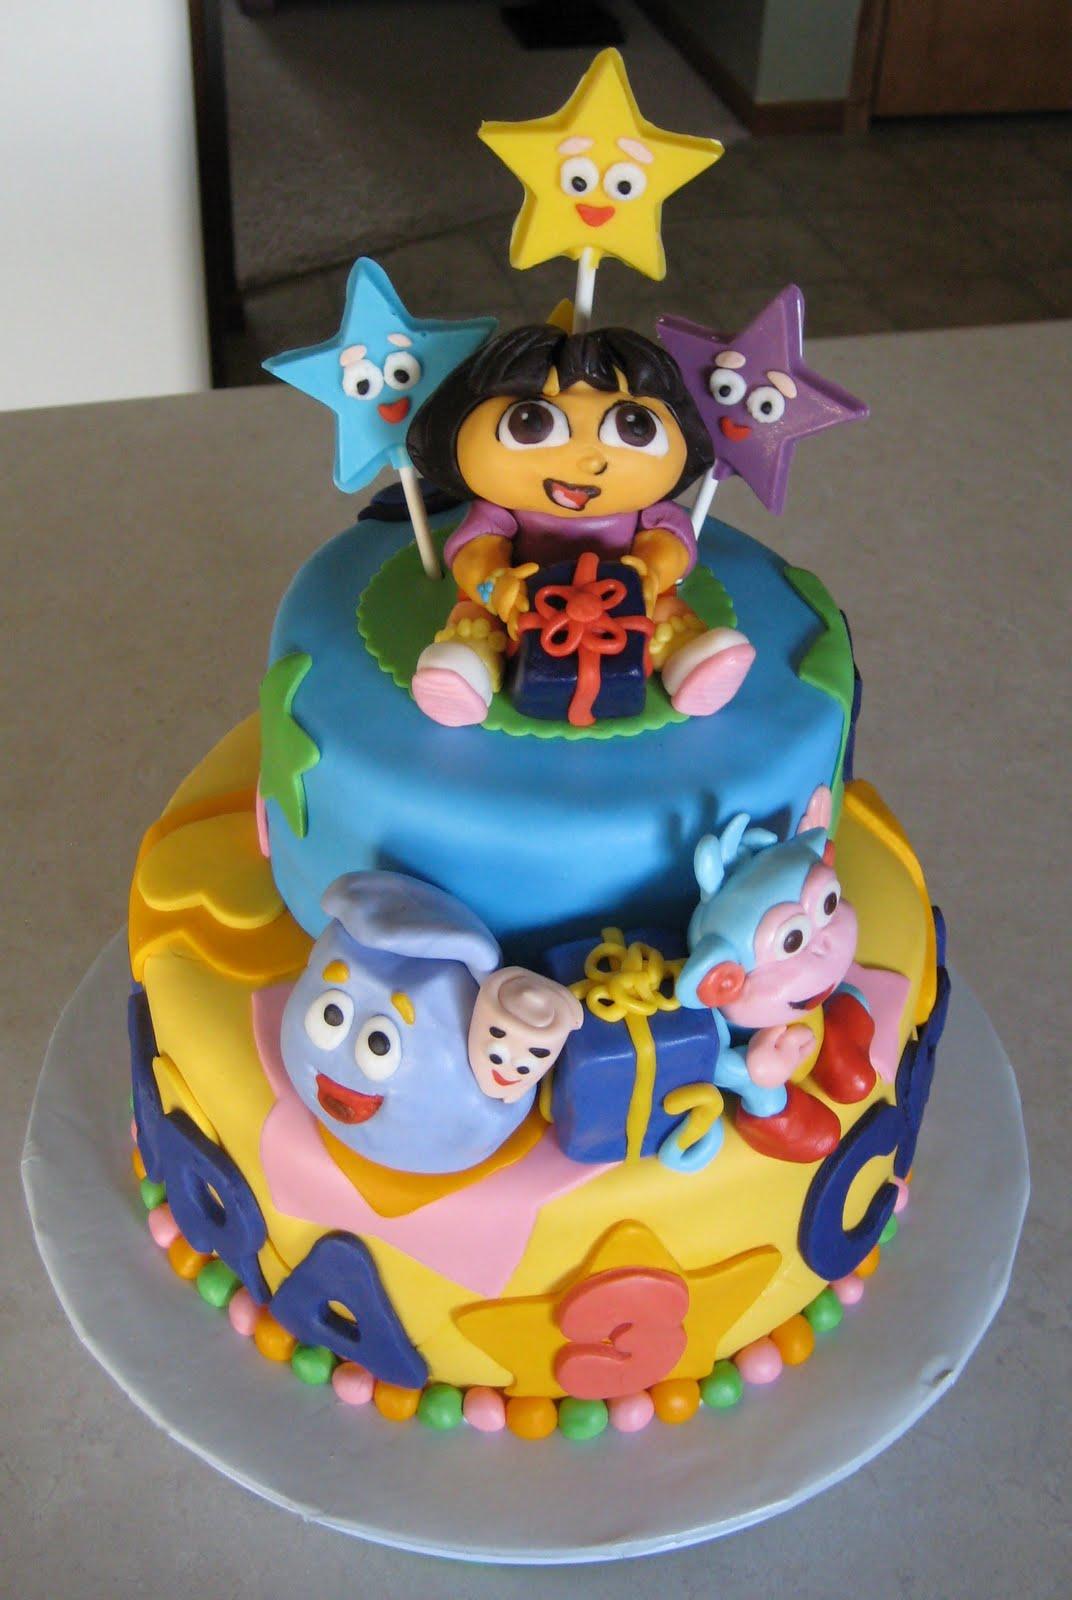 Dora Birthday Cakes At Walmart